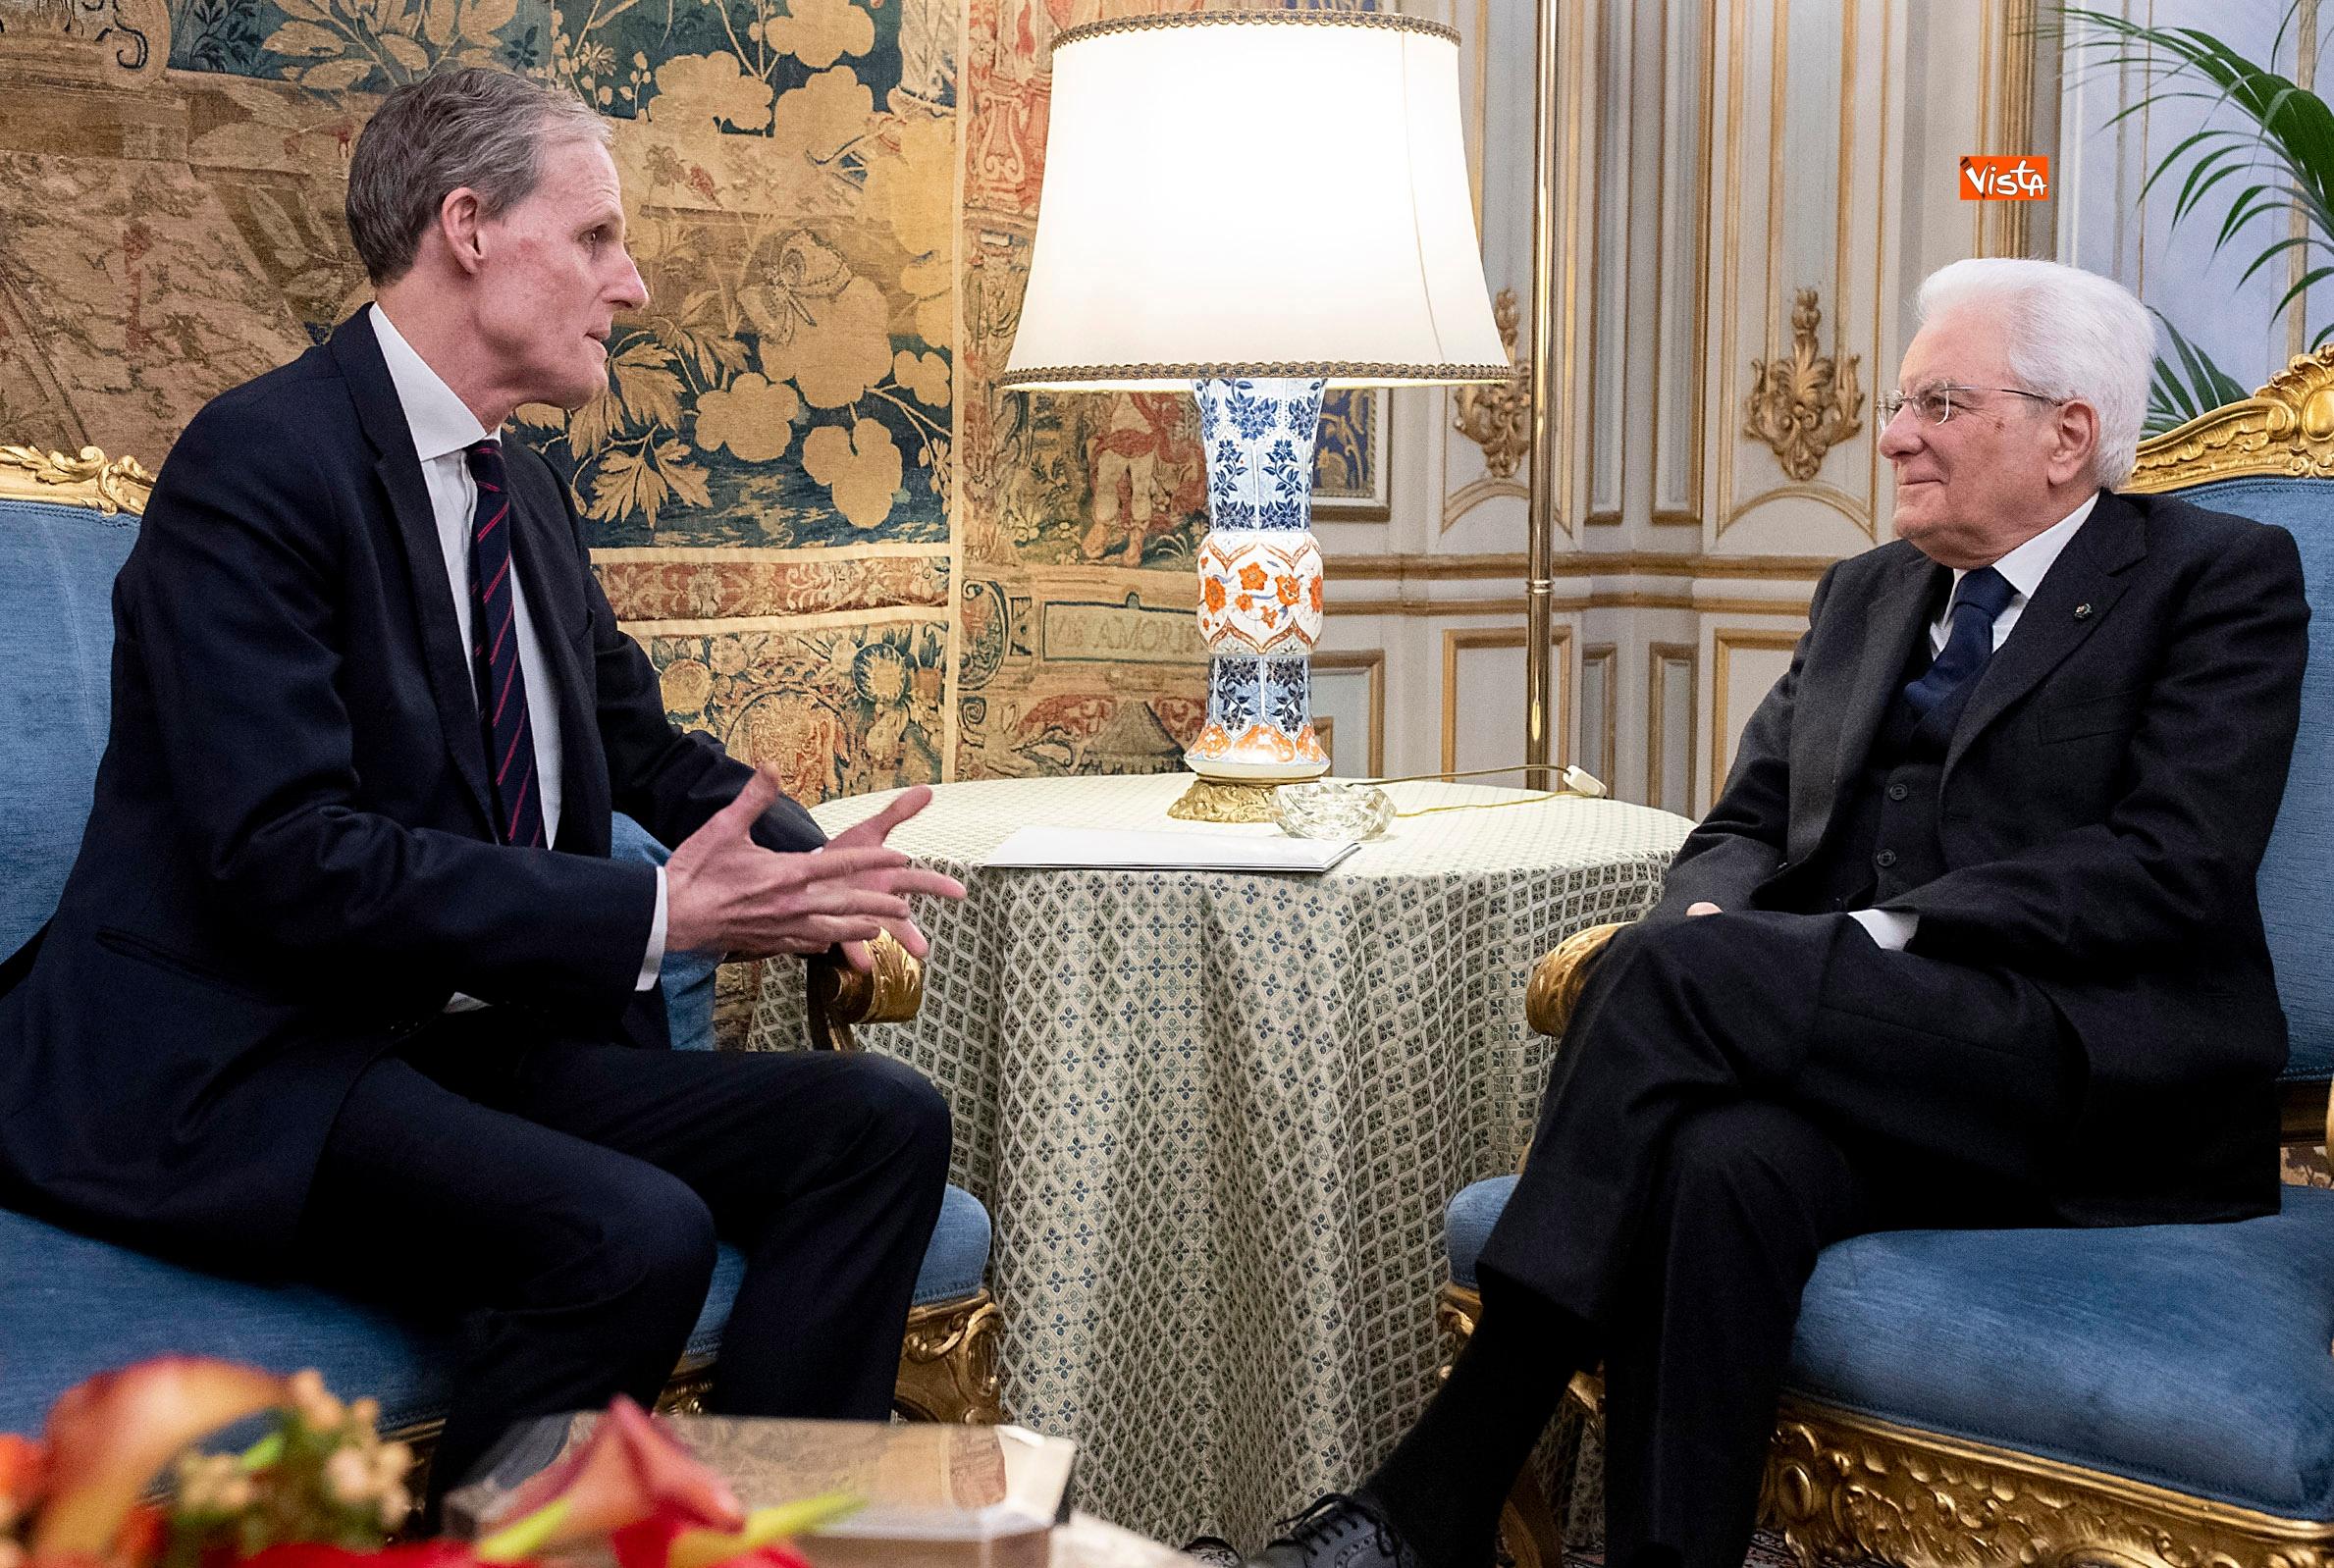 Mattarella incontra l'ambasciatore francese Masset al Quirinale_04